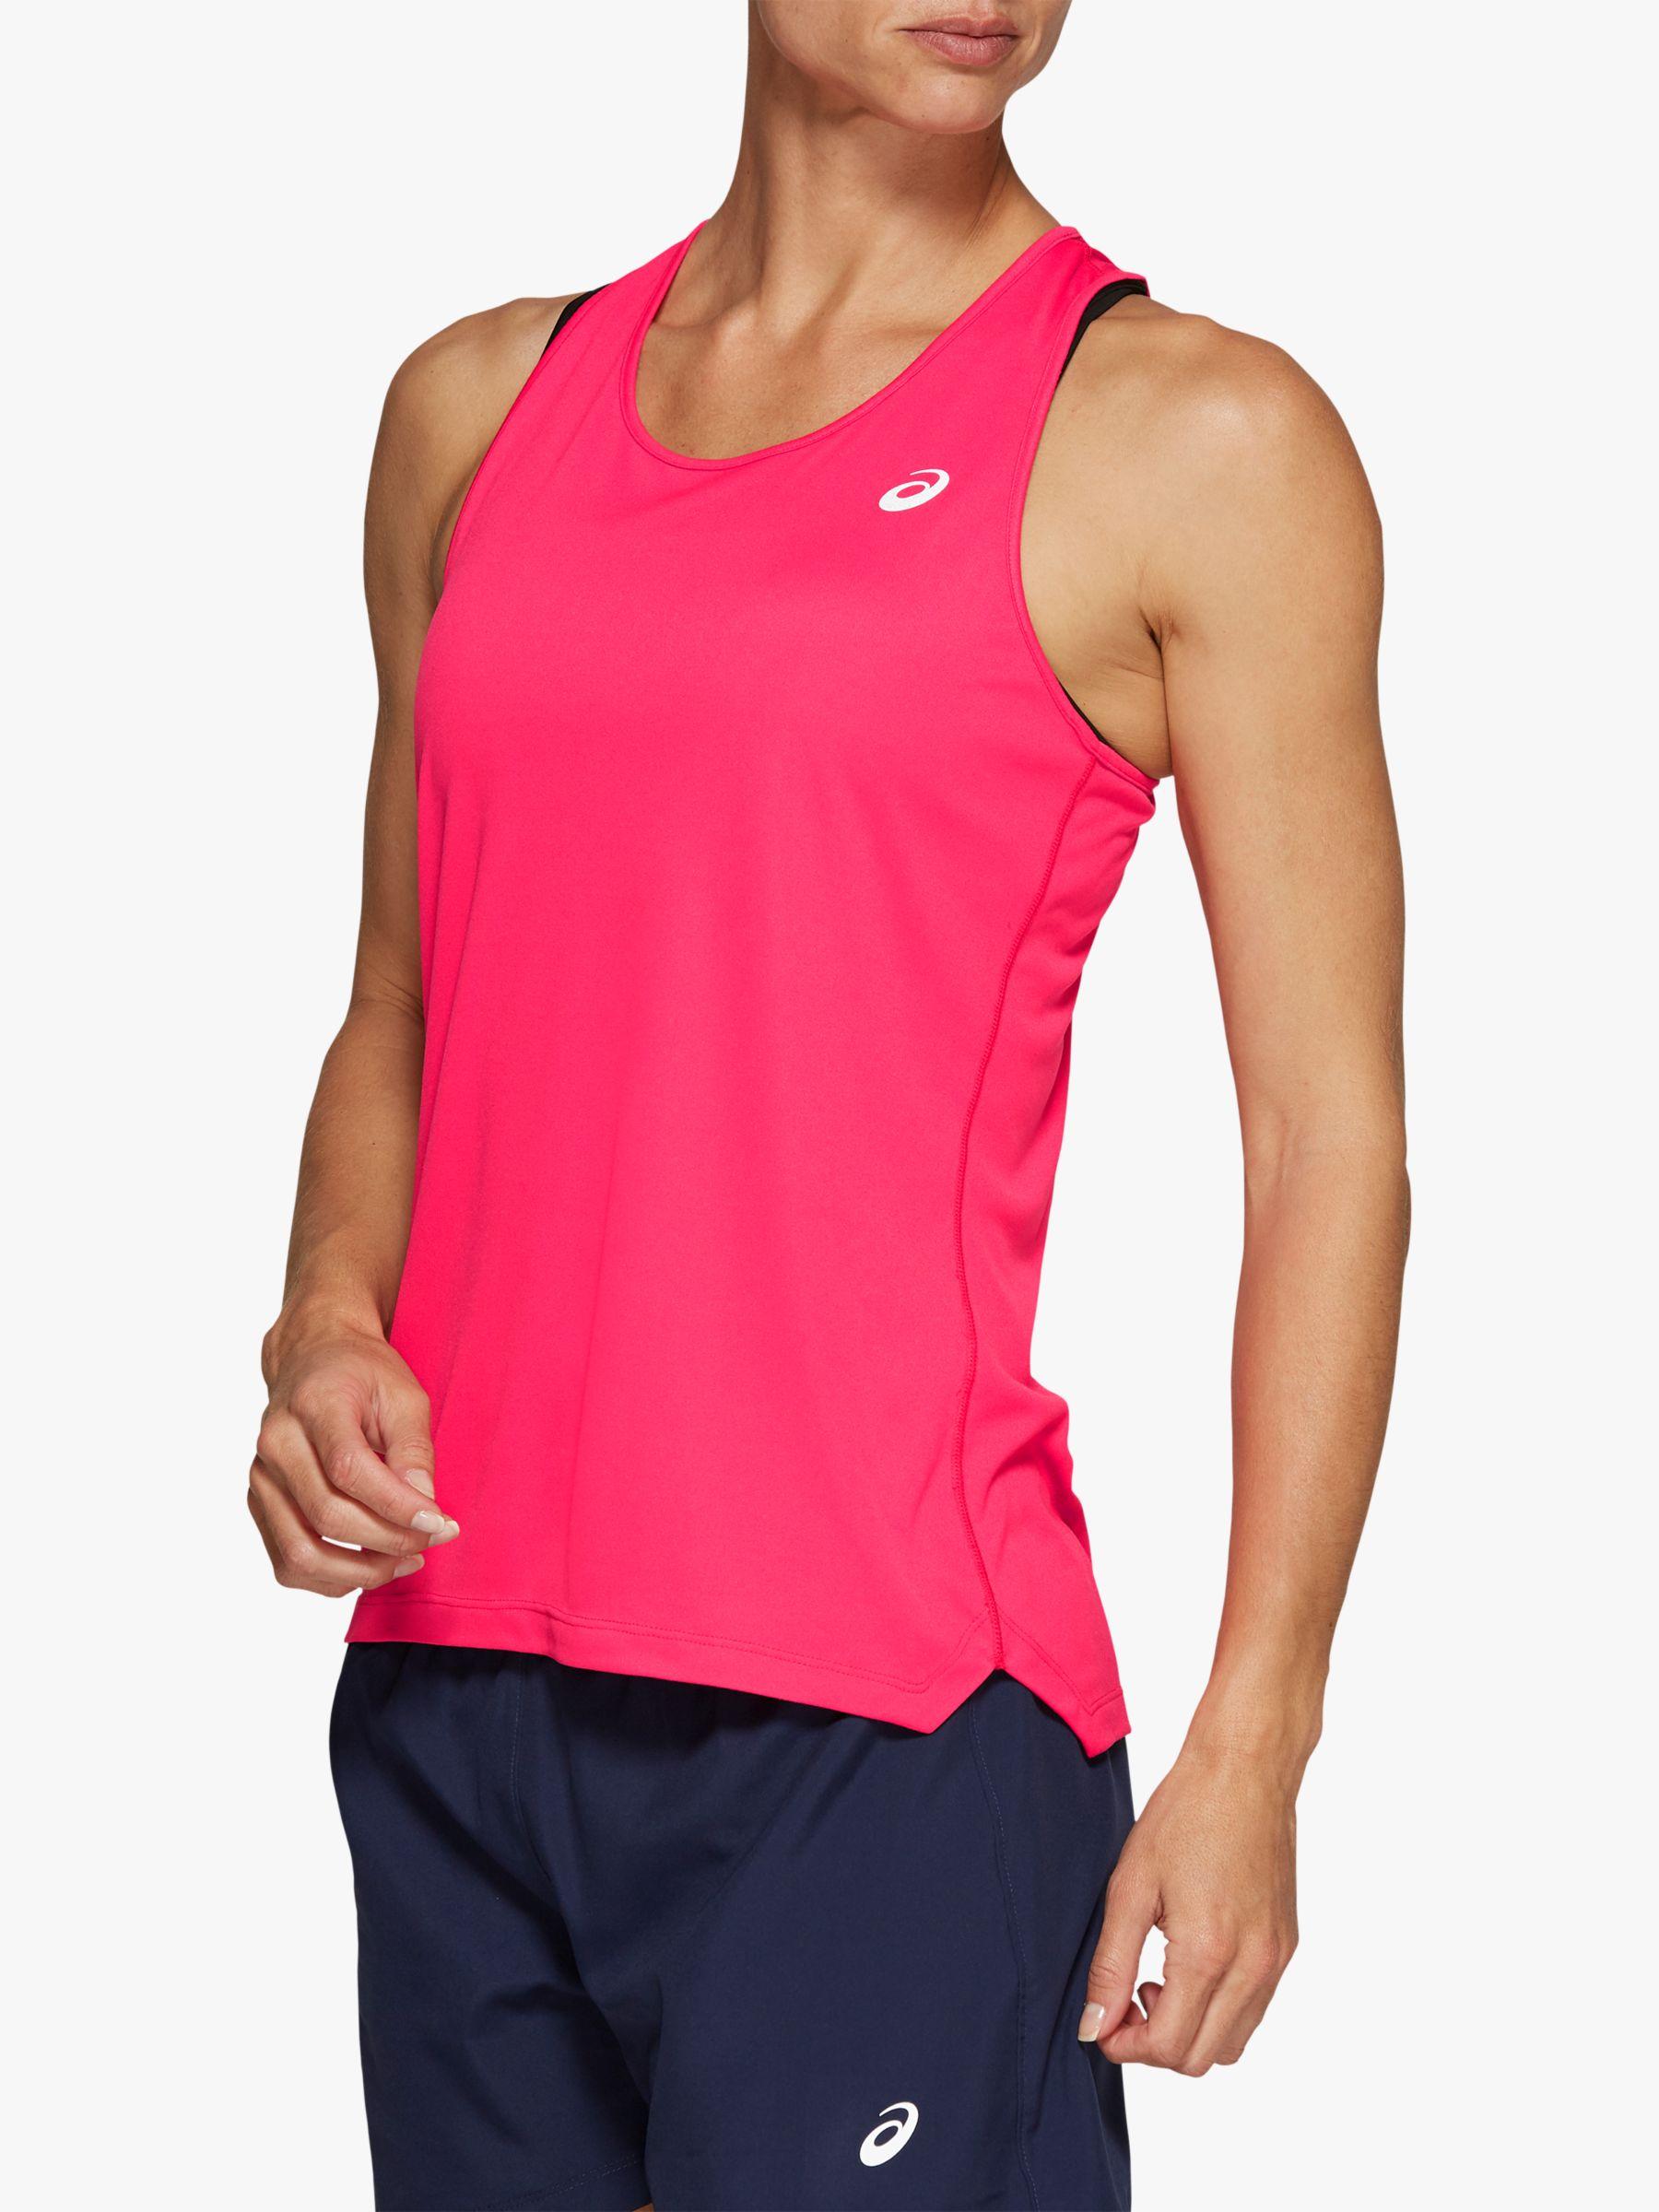 ASICS ASICS Silver Running Vest, Pixel Pink